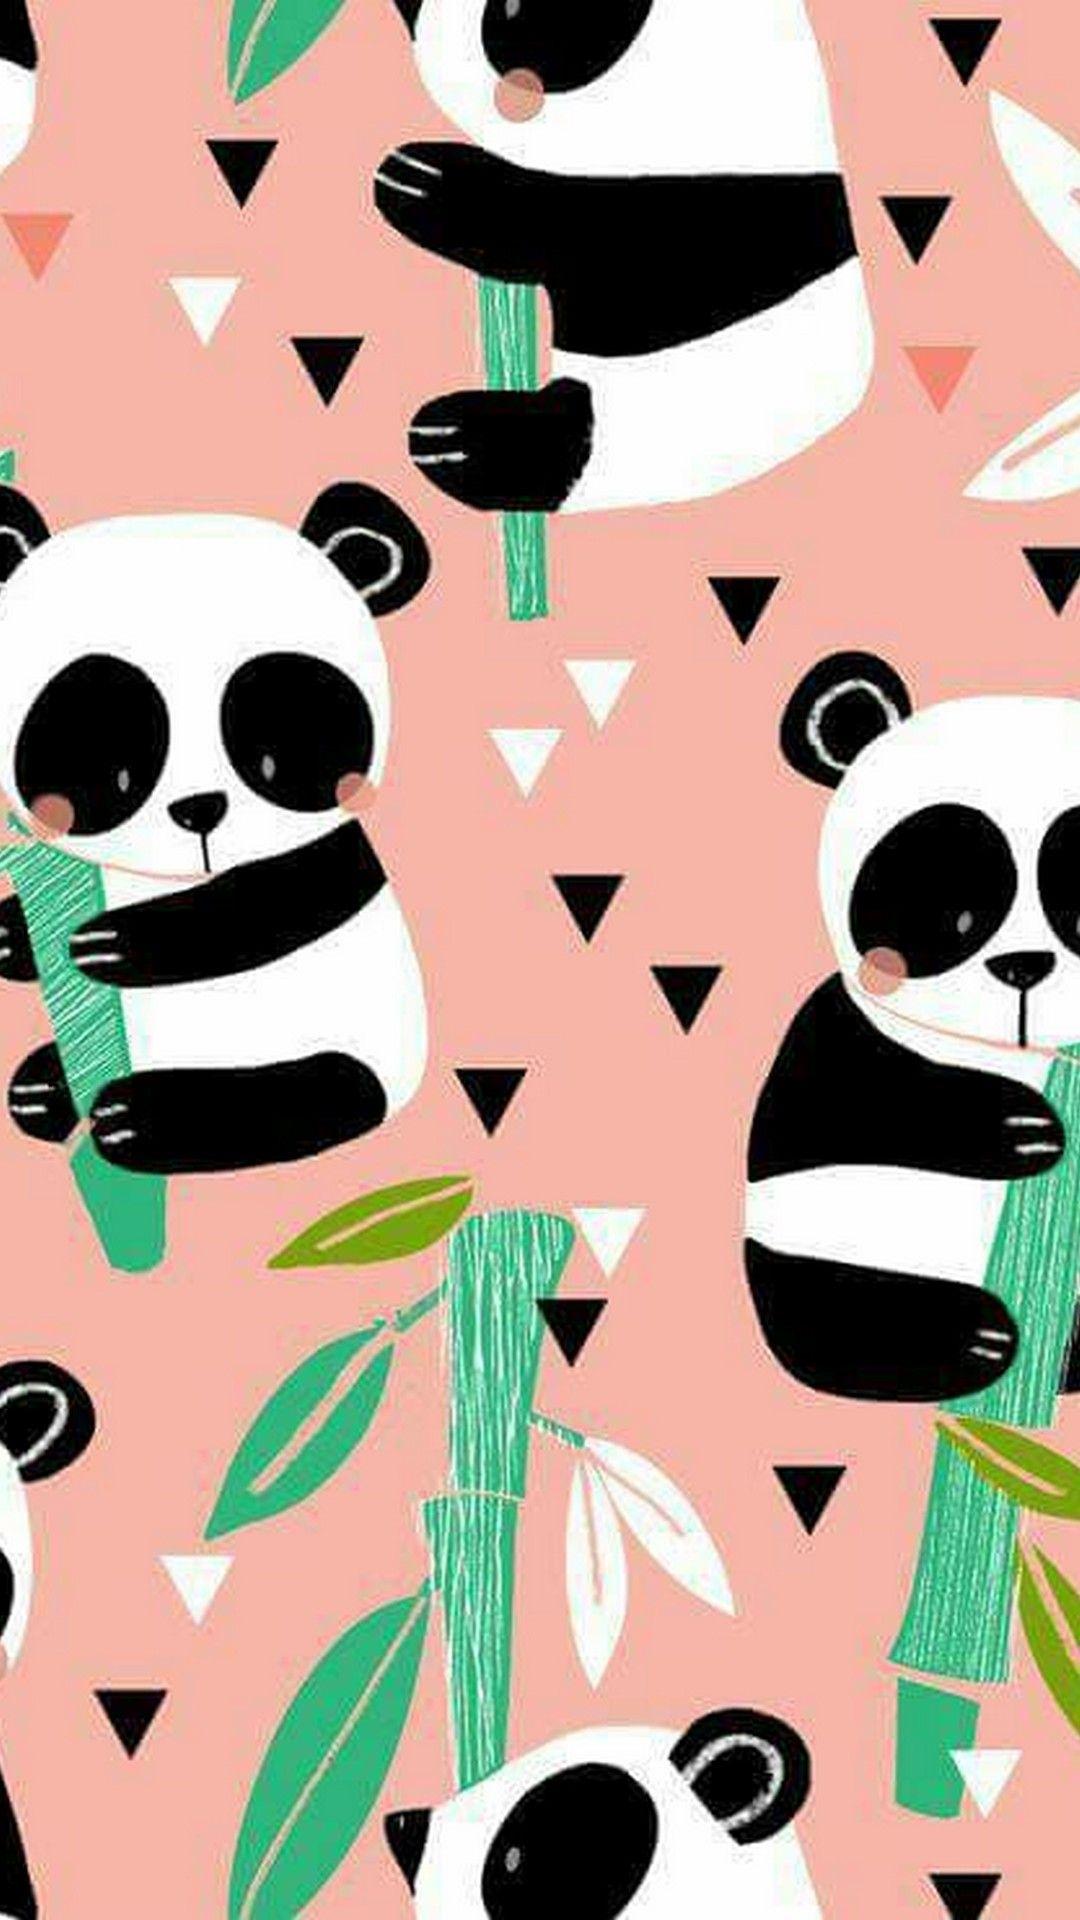 Full Hd Panda Wallpaper Hd For Android